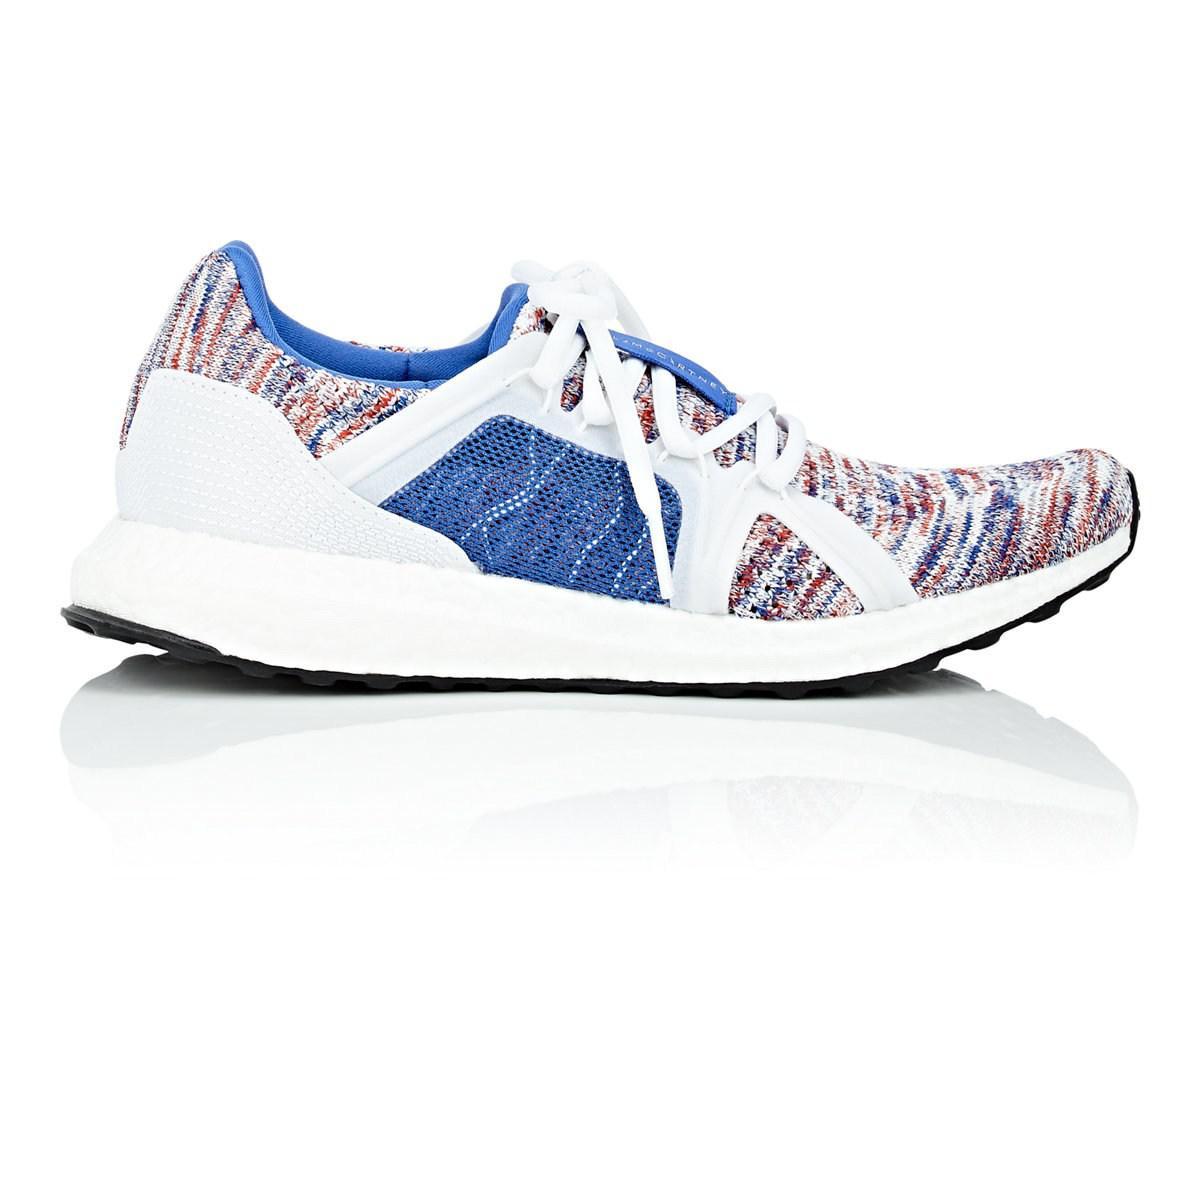 c9af678f5 Adidas By Stella Mccartney Ultraboost Sneakers Size 5.5 in Blue - Lyst